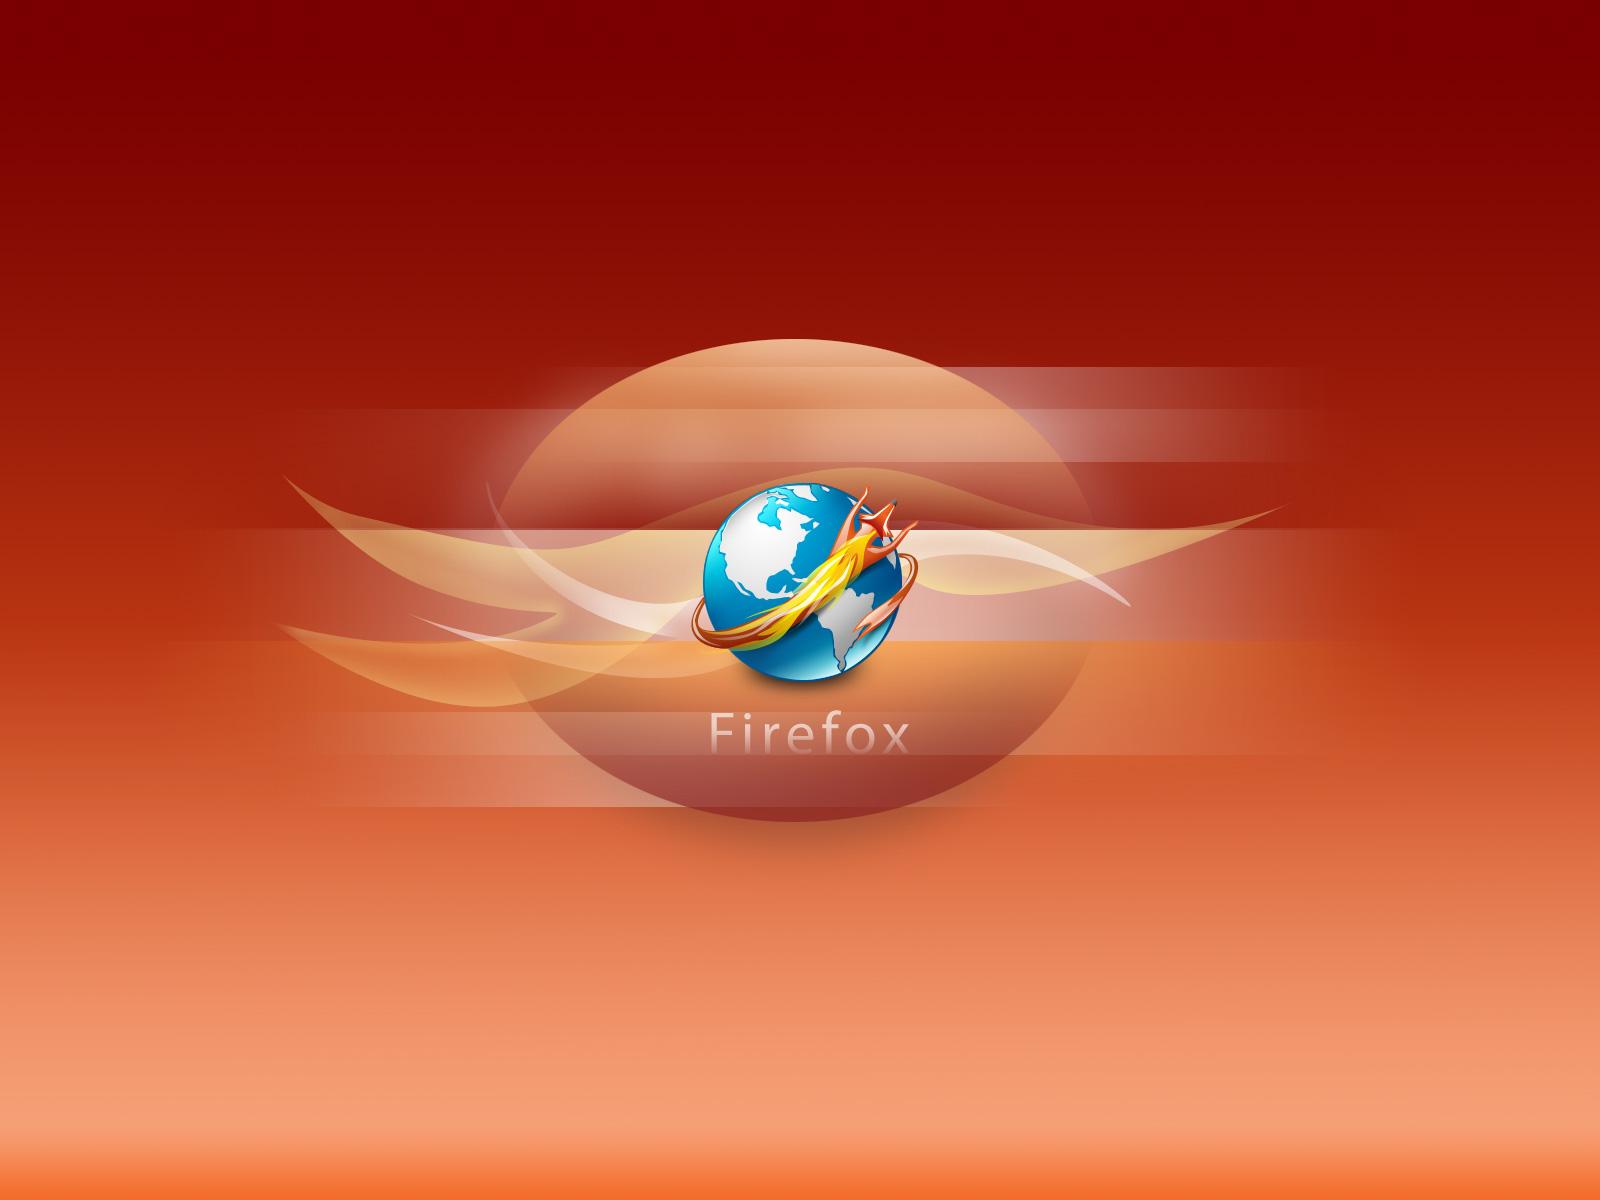 http://2.bp.blogspot.com/-O1_Q1voZhUk/Tgm4gefxUXI/AAAAAAAAA9o/yFGCe63sArg/s1600/firefox1%2Bby%2Bwww.bdtvstar.com%2B%252832%2529.jpg